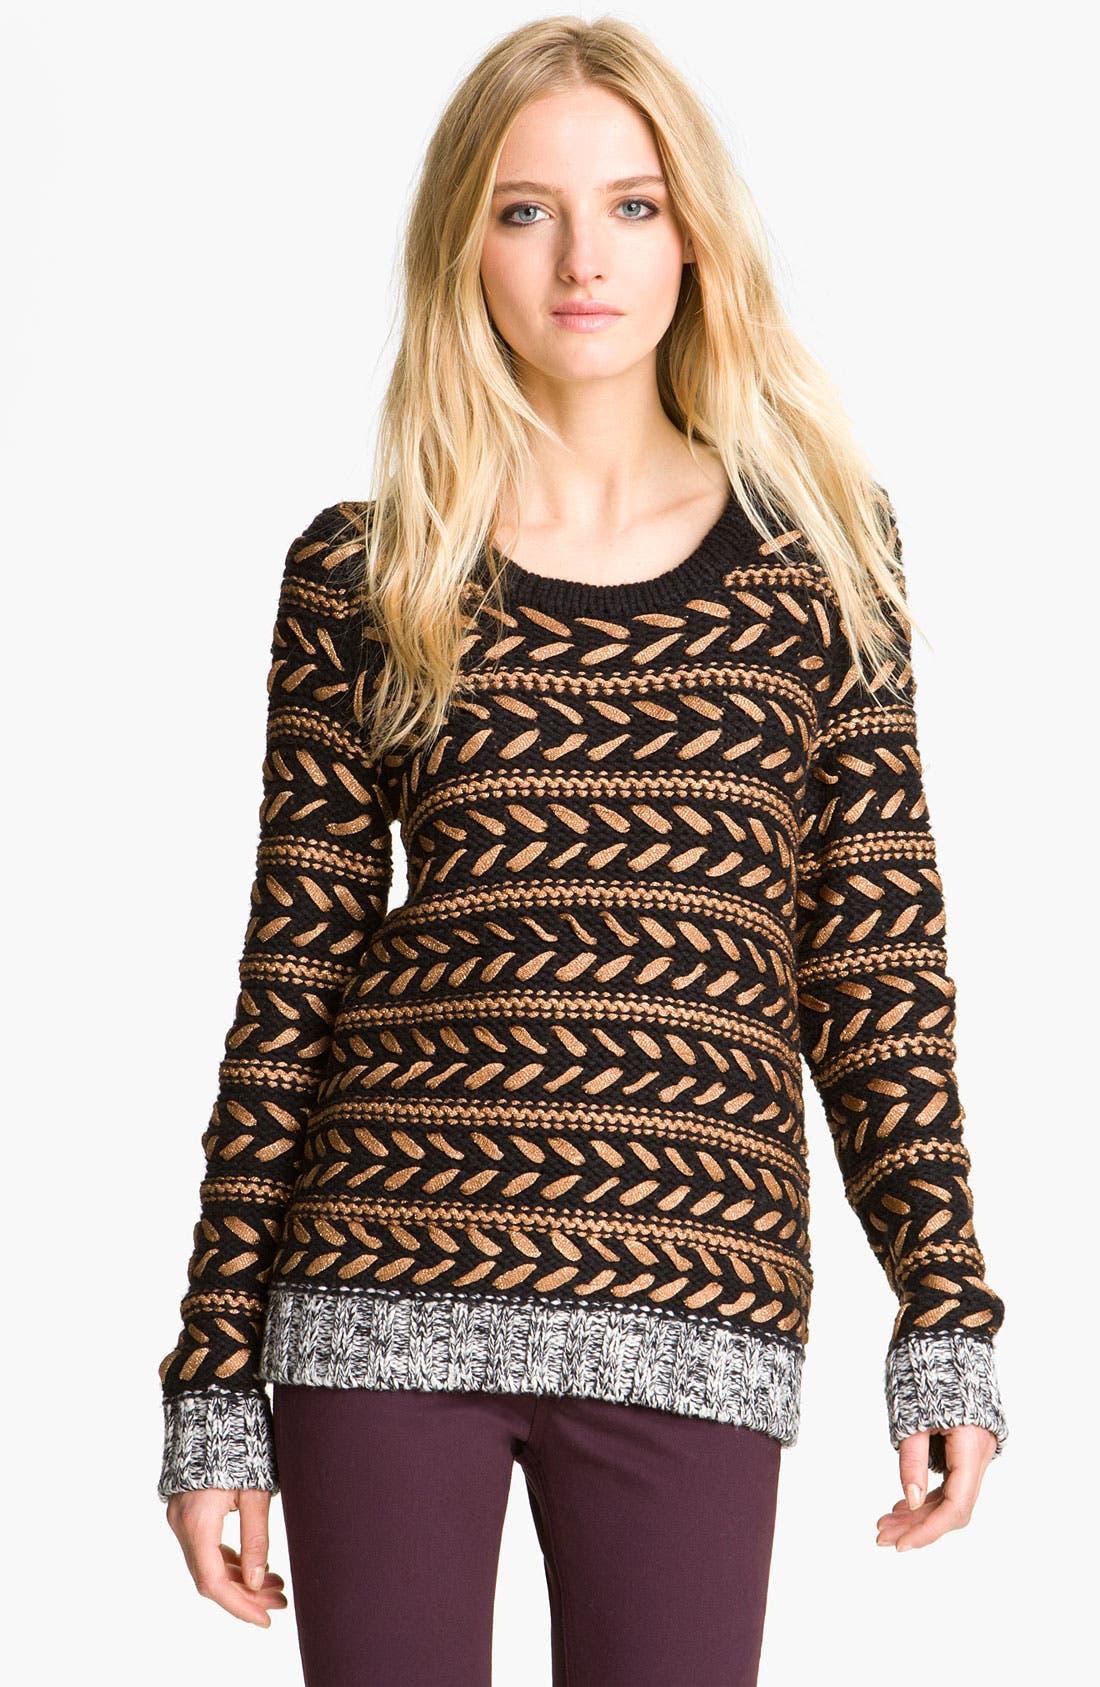 Alternate Image 1 Selected - rag & bone 'Lisbeth' Contrast Crewneck Sweater